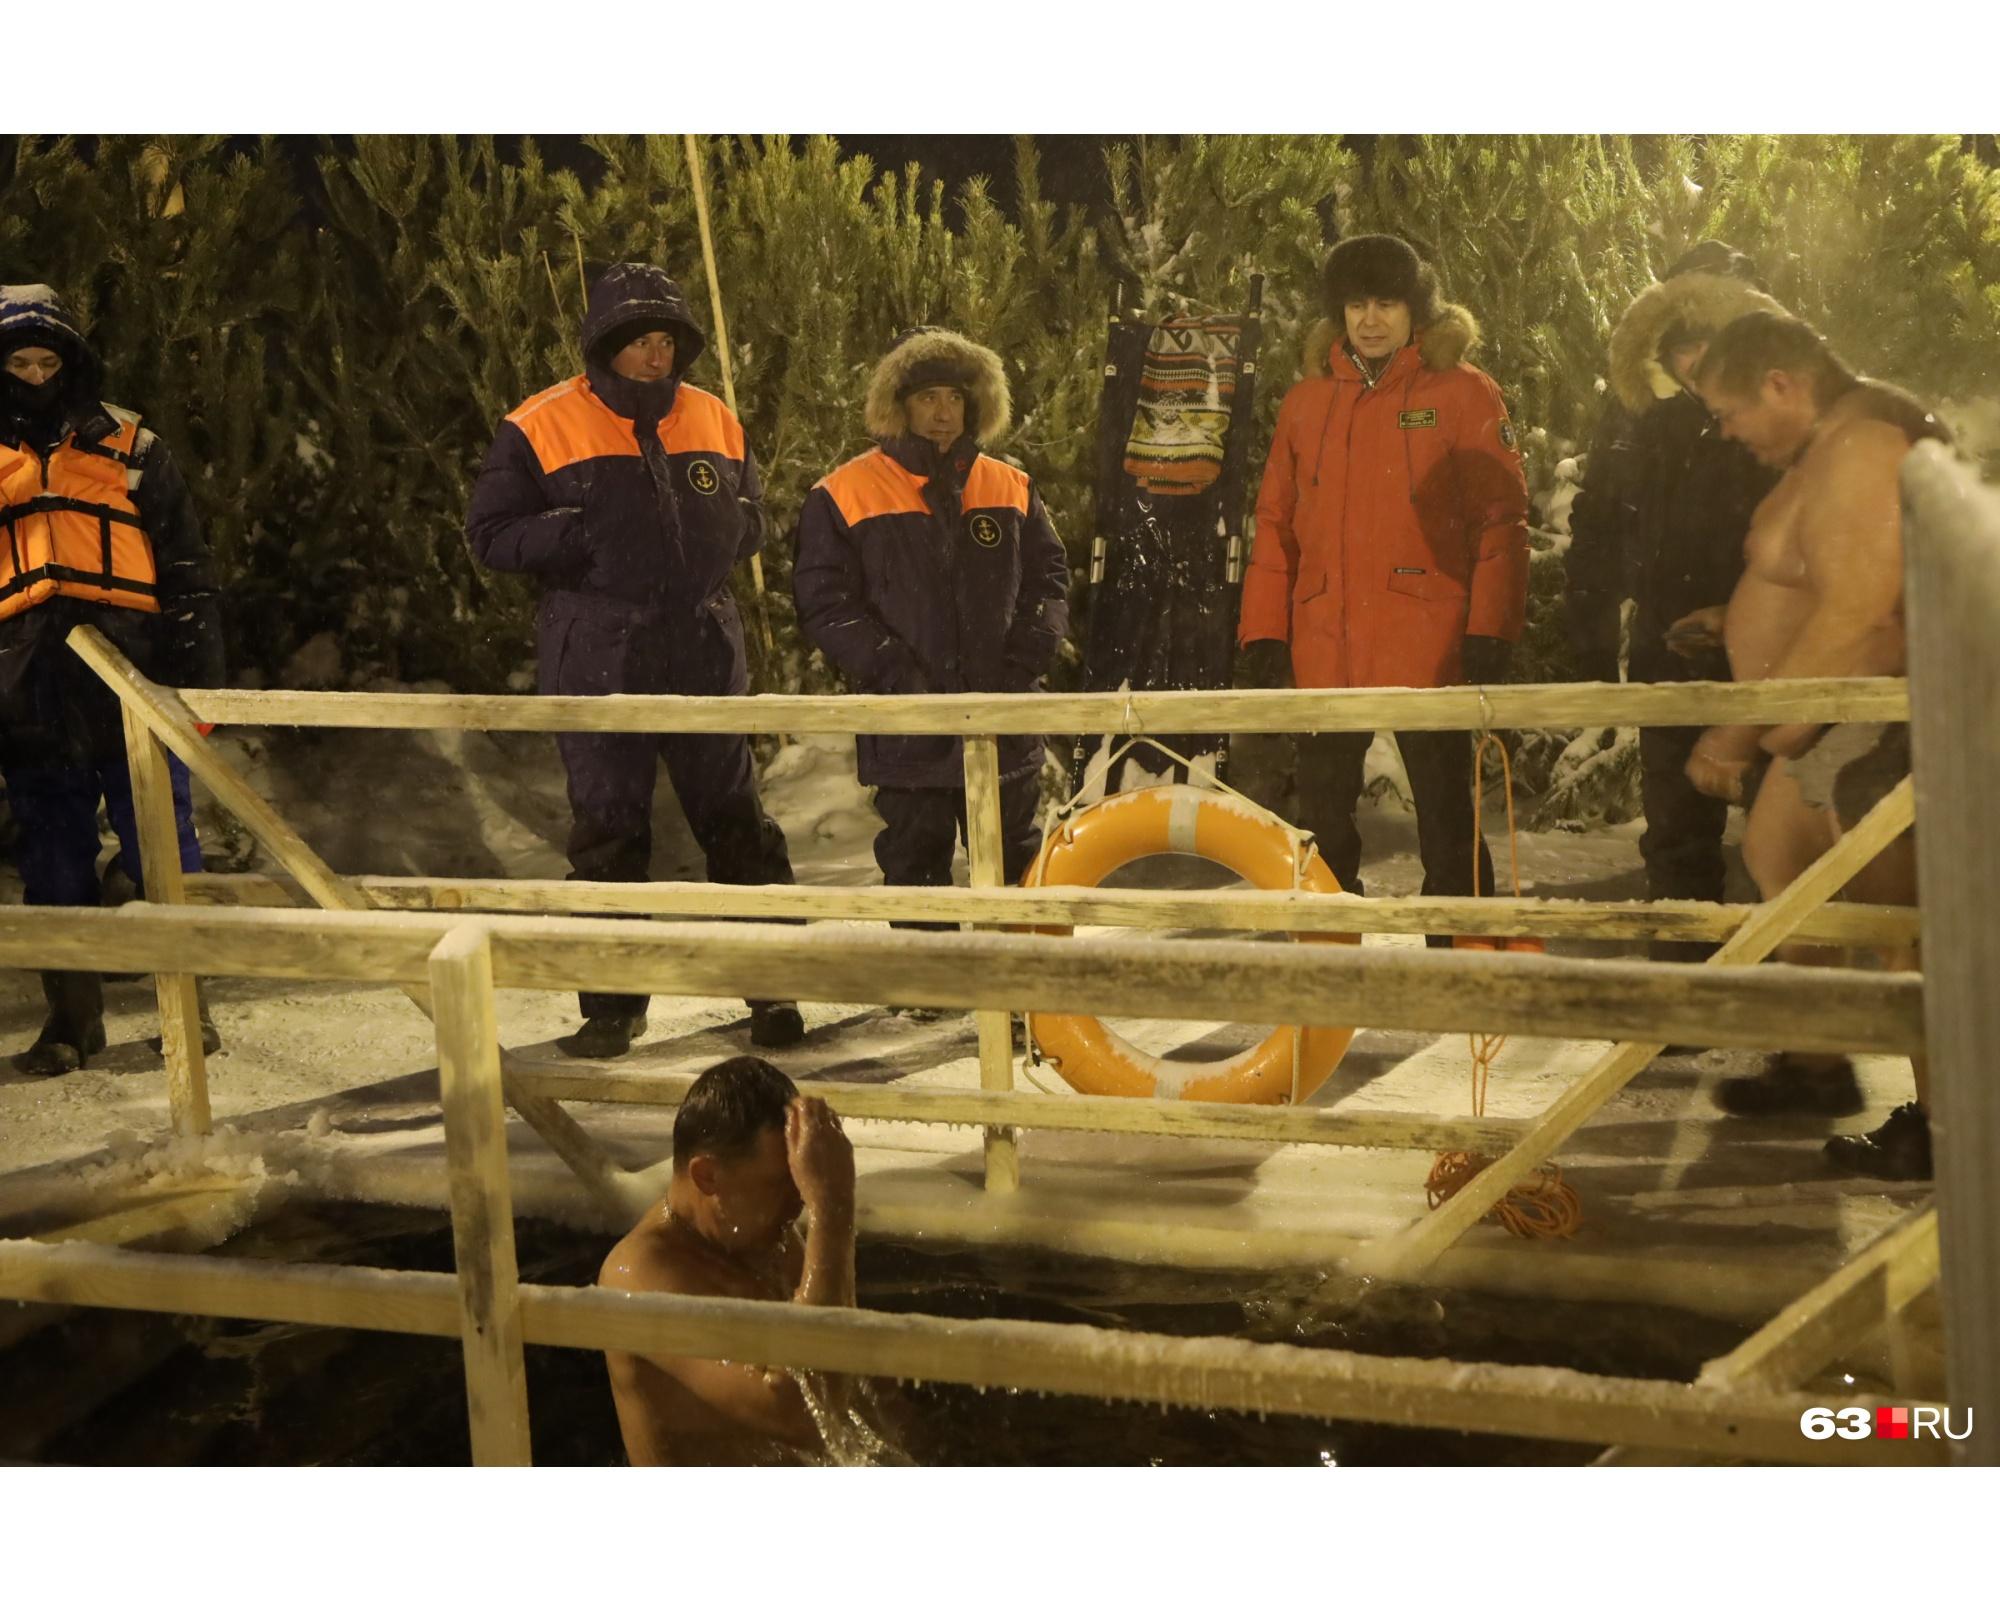 За безопасностью купающихся следят сотрудники МЧС